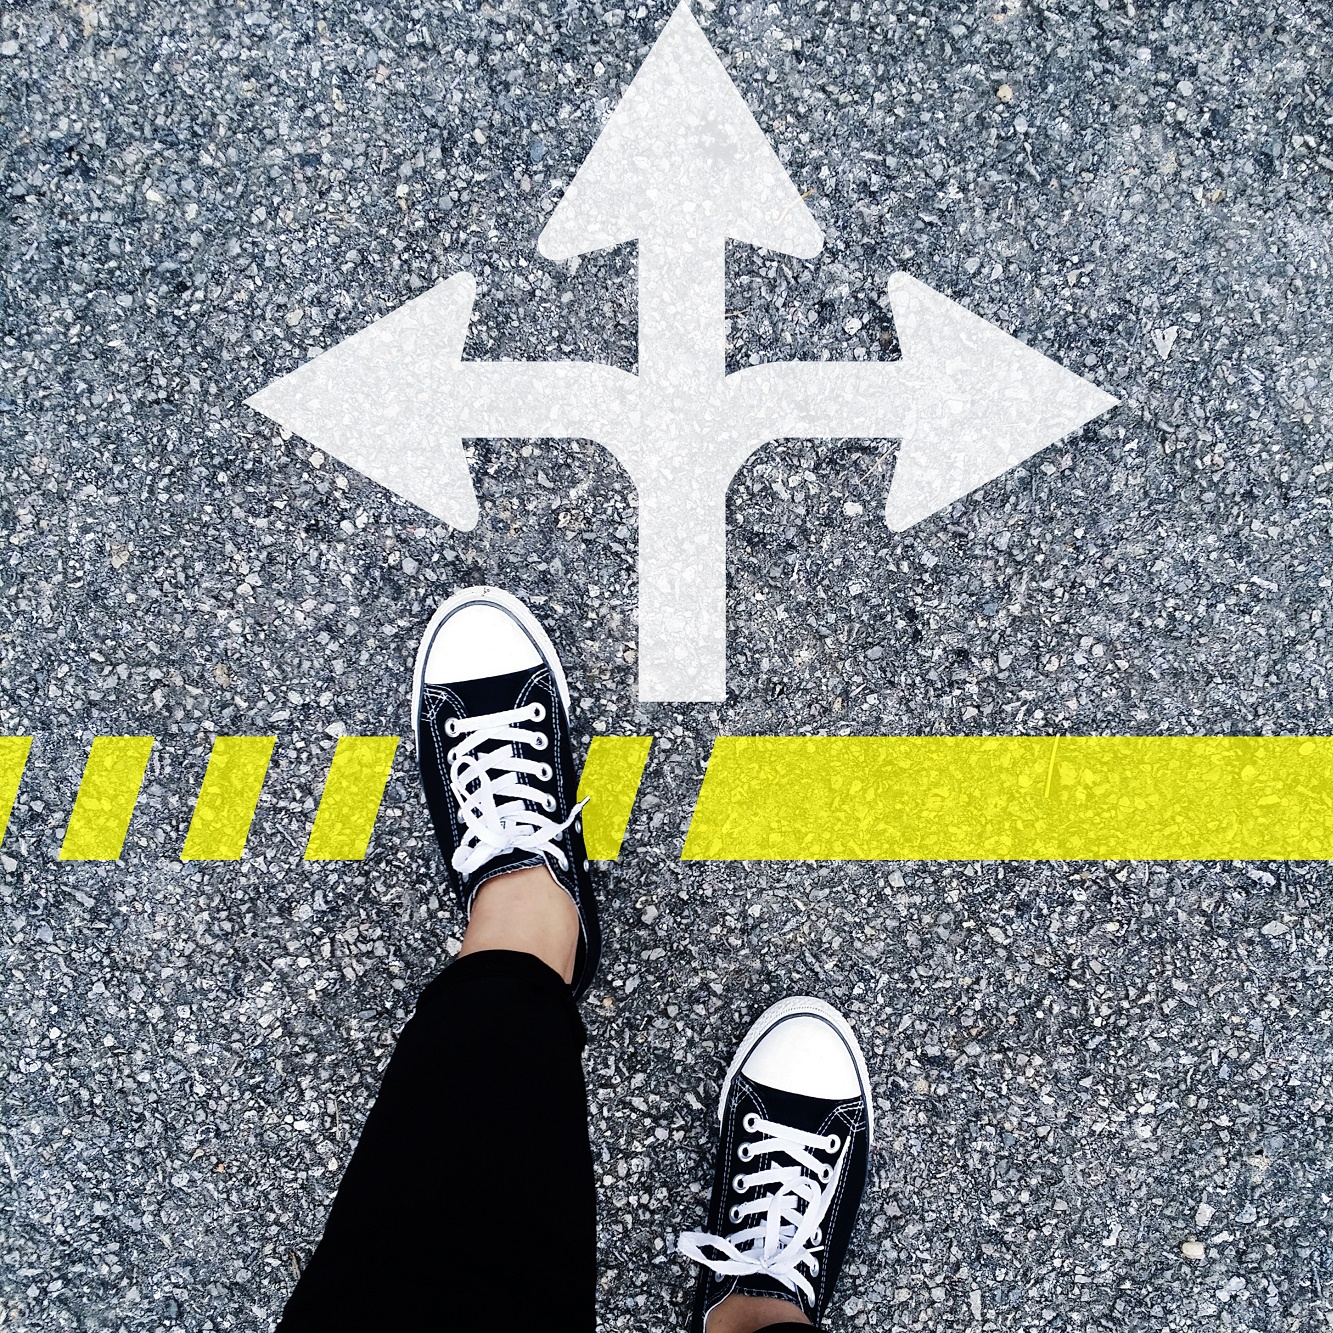 asphalt-direction-font-art-shape-choose-the-right-direction-567033-pxhere.com.jpg